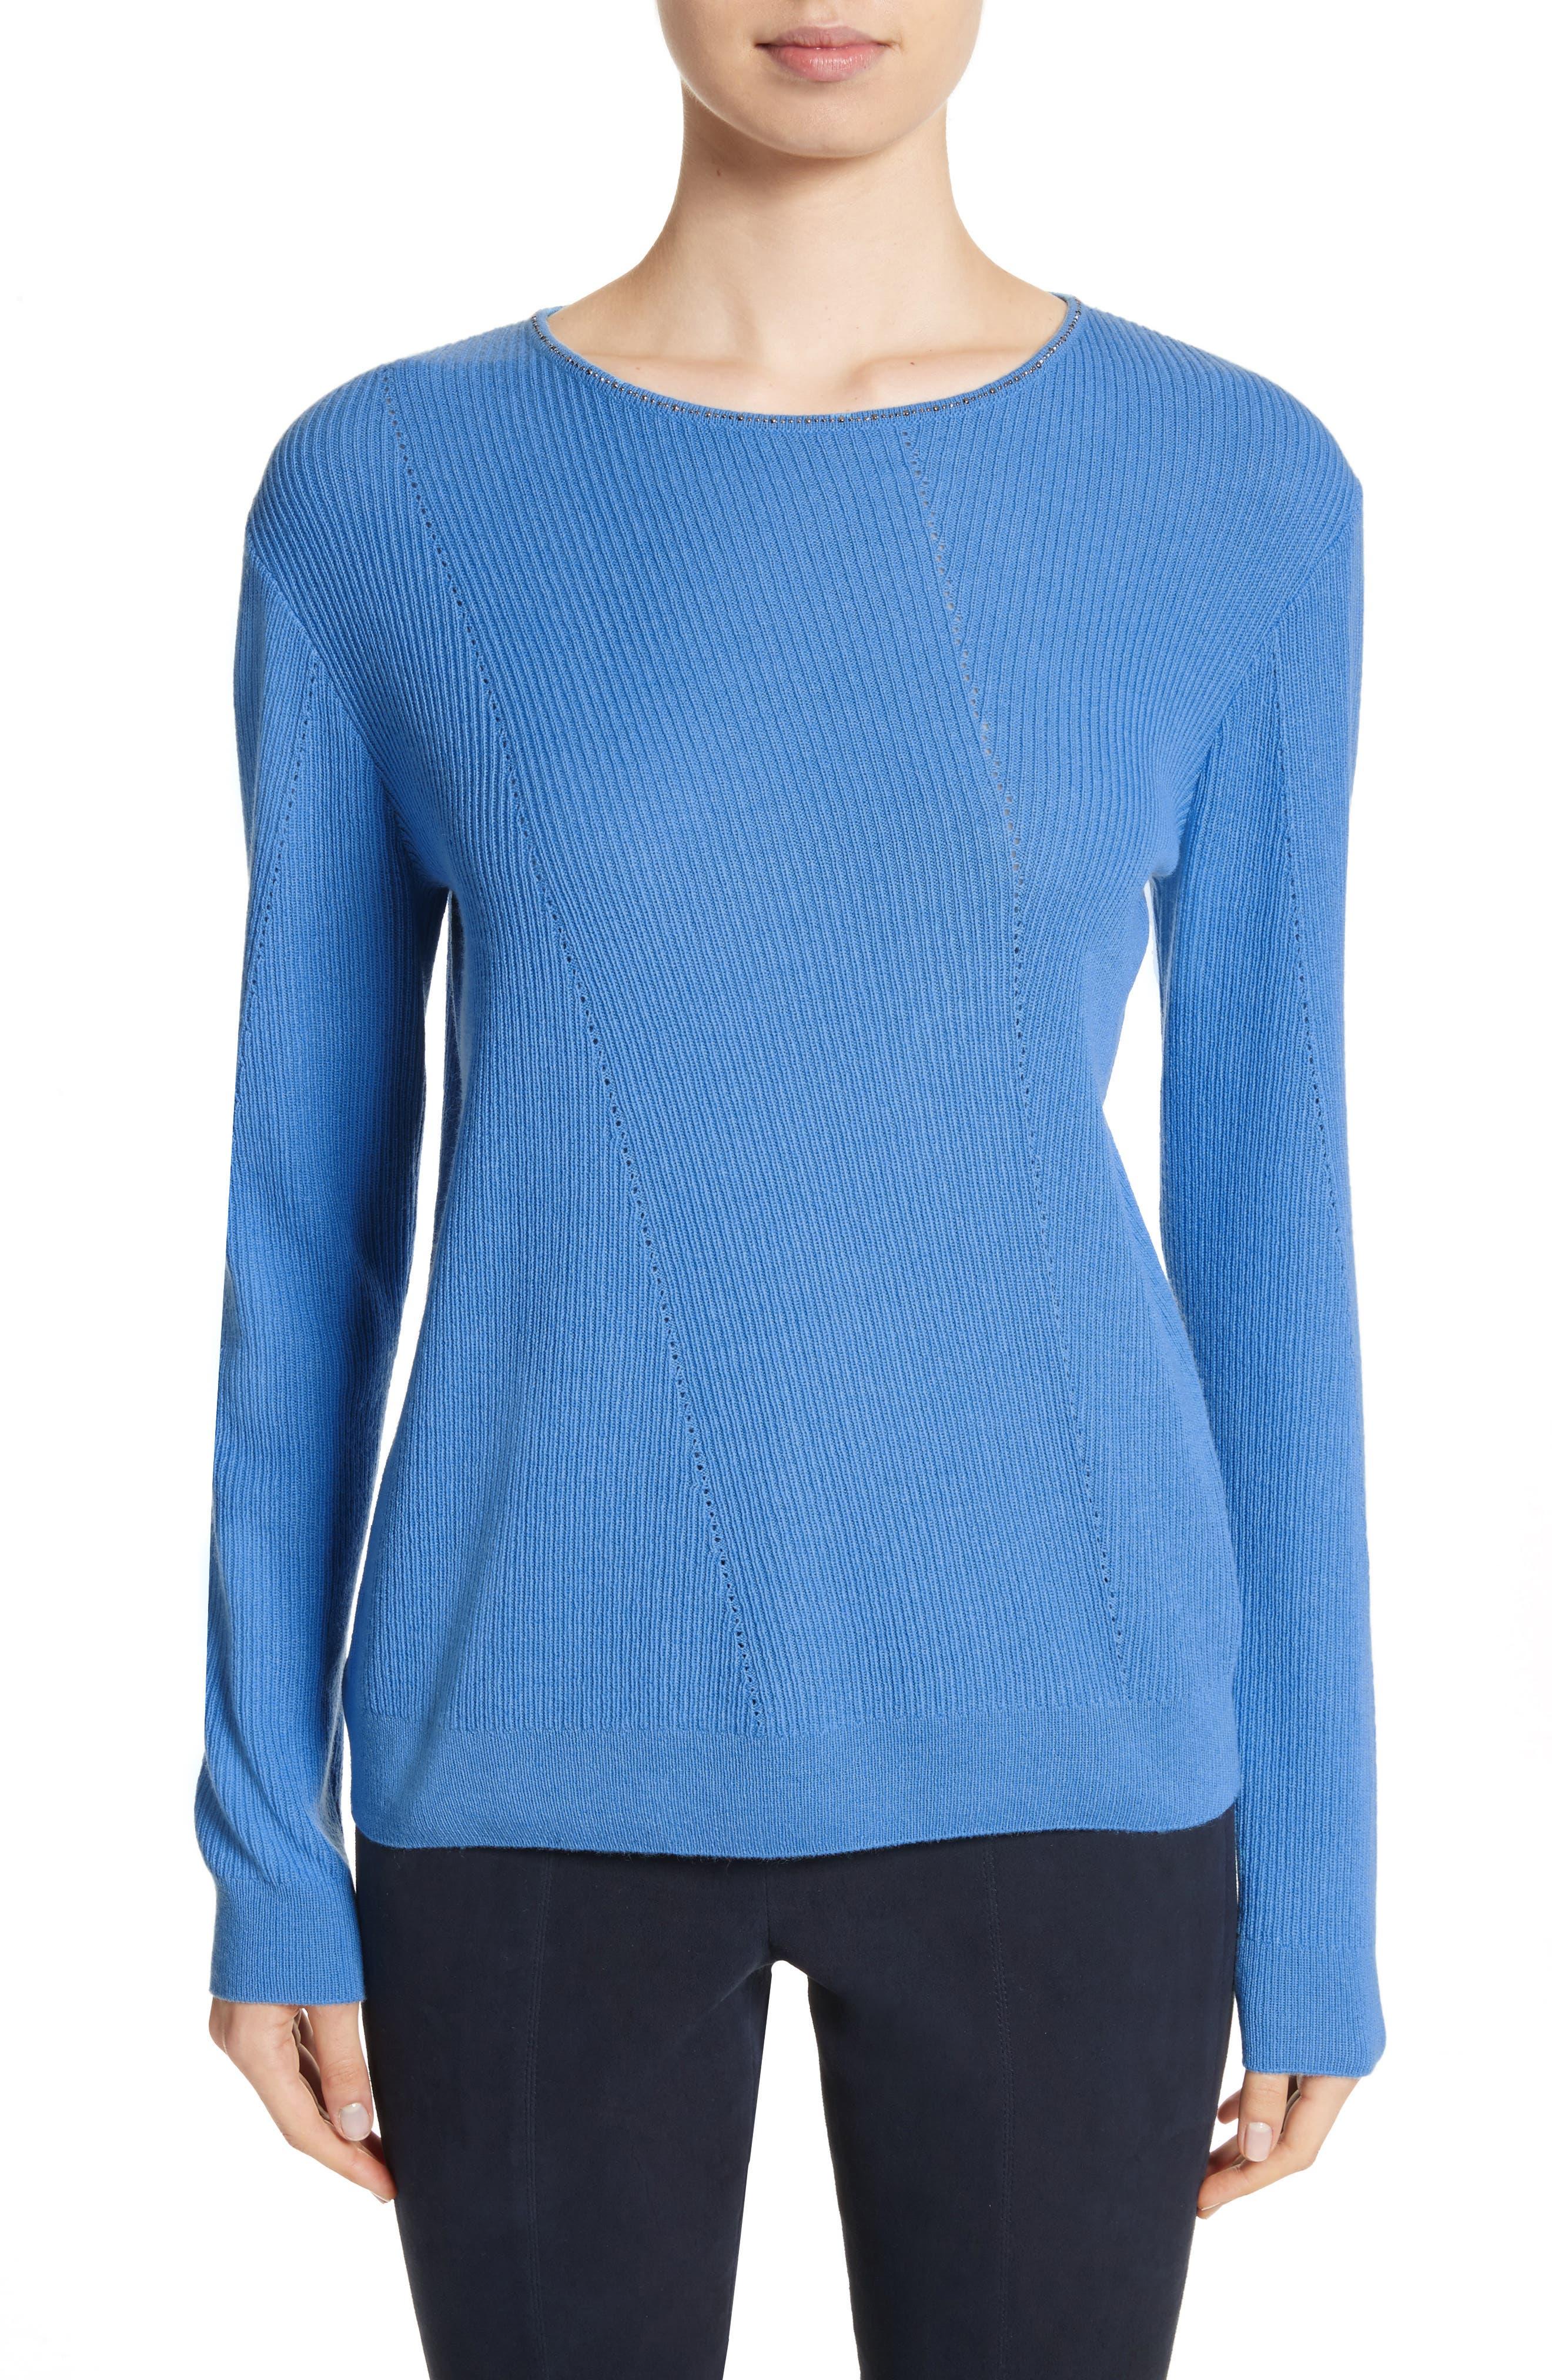 Cashmere Sweater,                         Main,                         color, 420